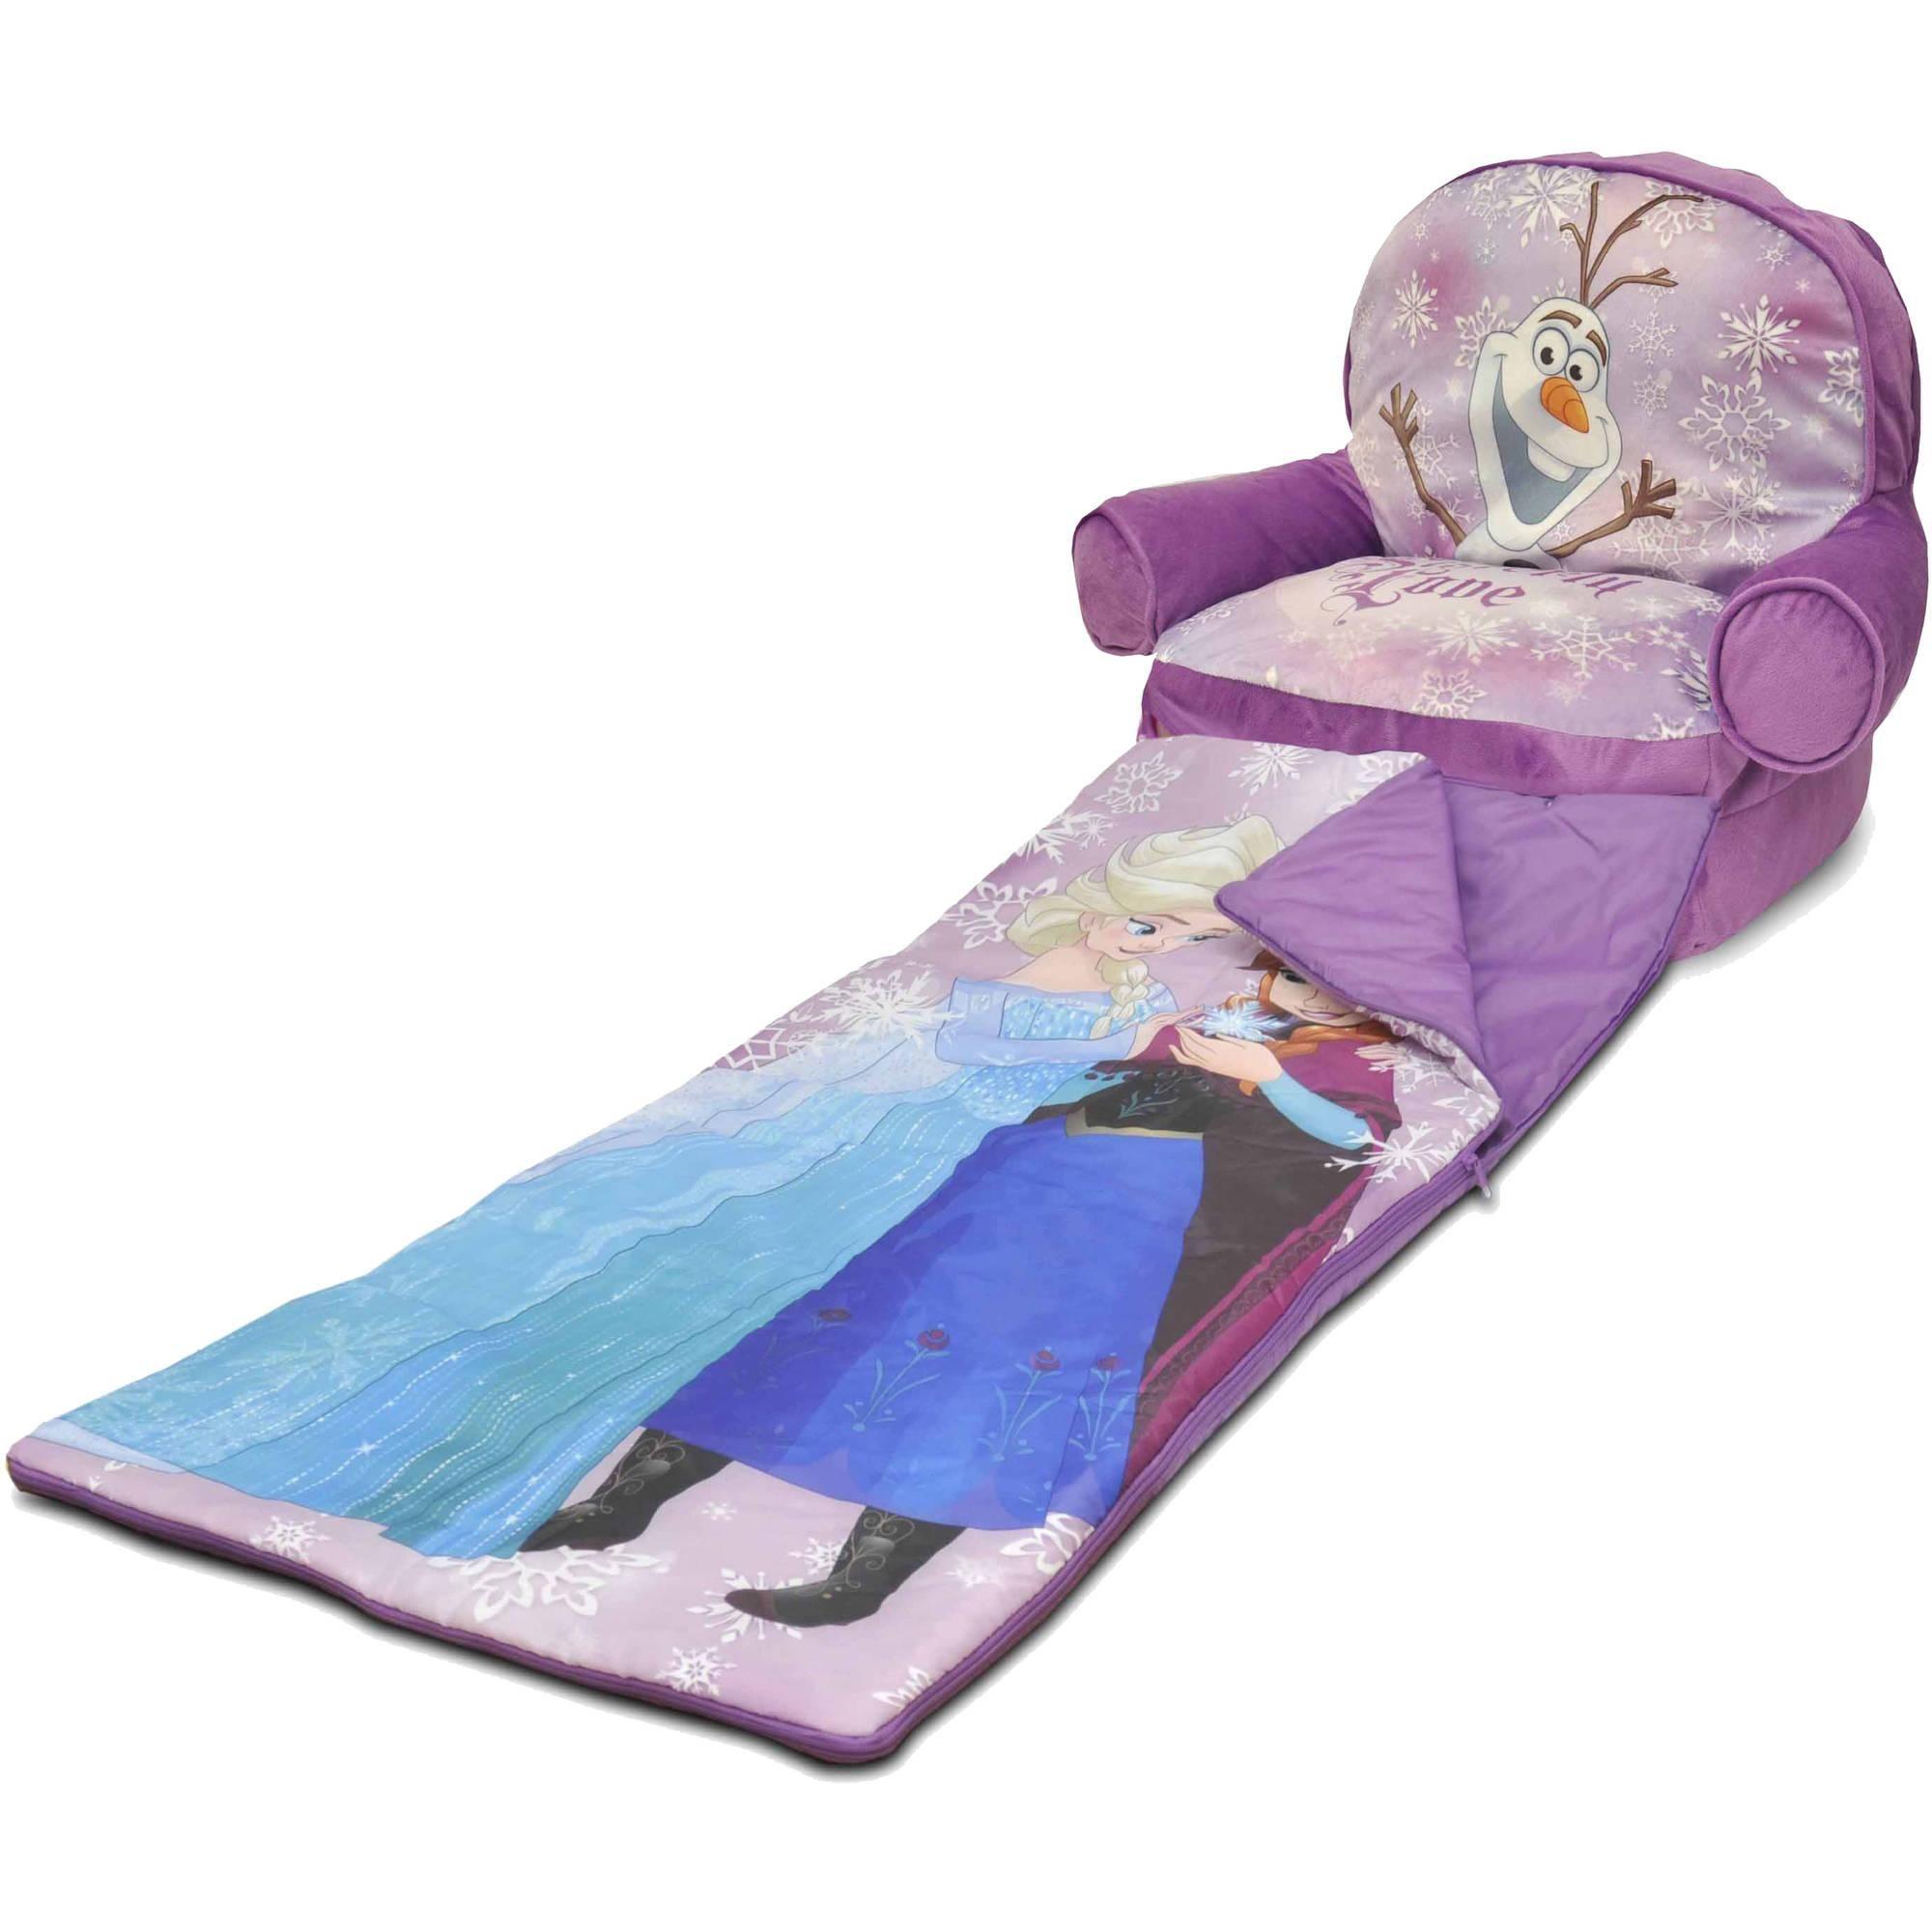 Groovy Walmart Disney Frozen Bean Bag With Bonus Slumber Bag Only Creativecarmelina Interior Chair Design Creativecarmelinacom